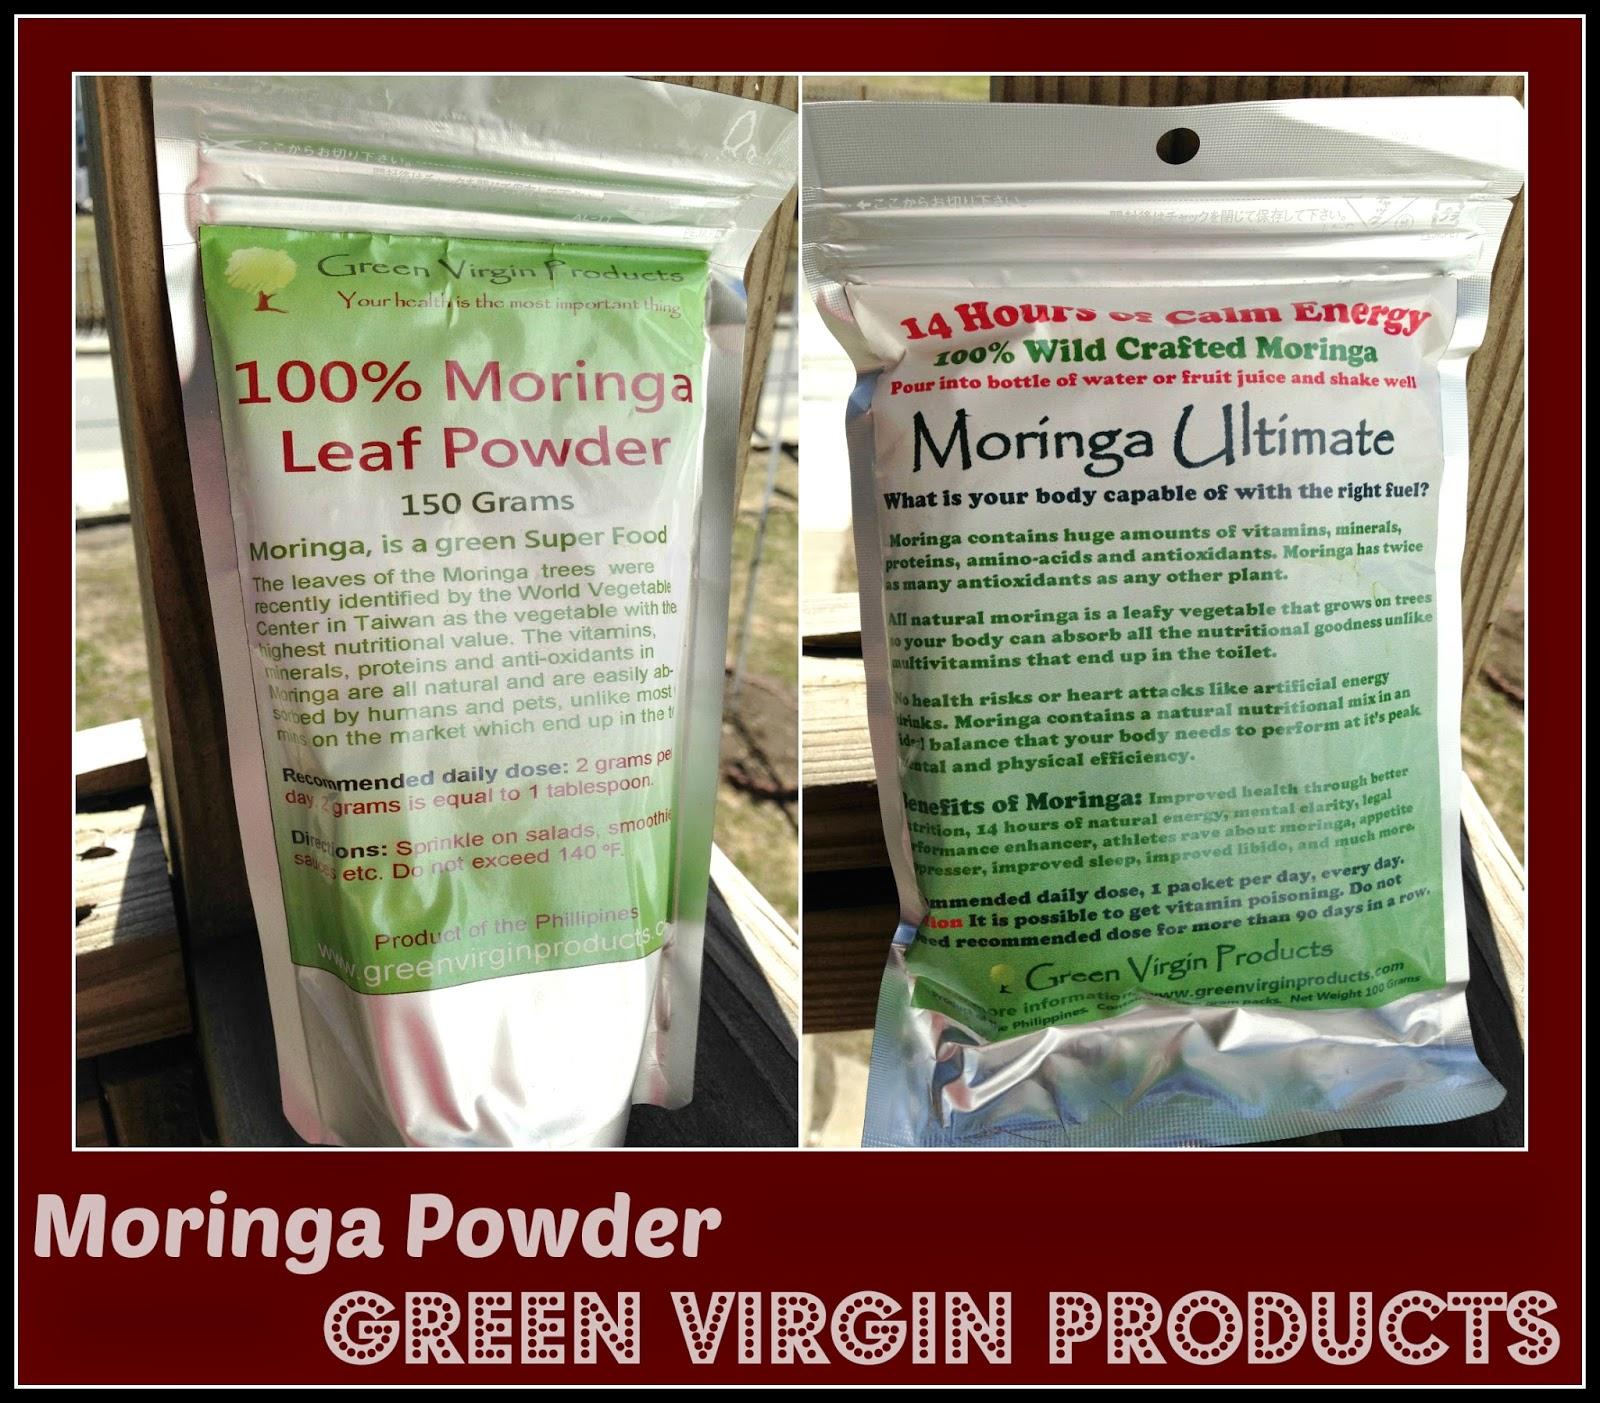 Green Virgin Products - Moringa Powder Review and Giveaway